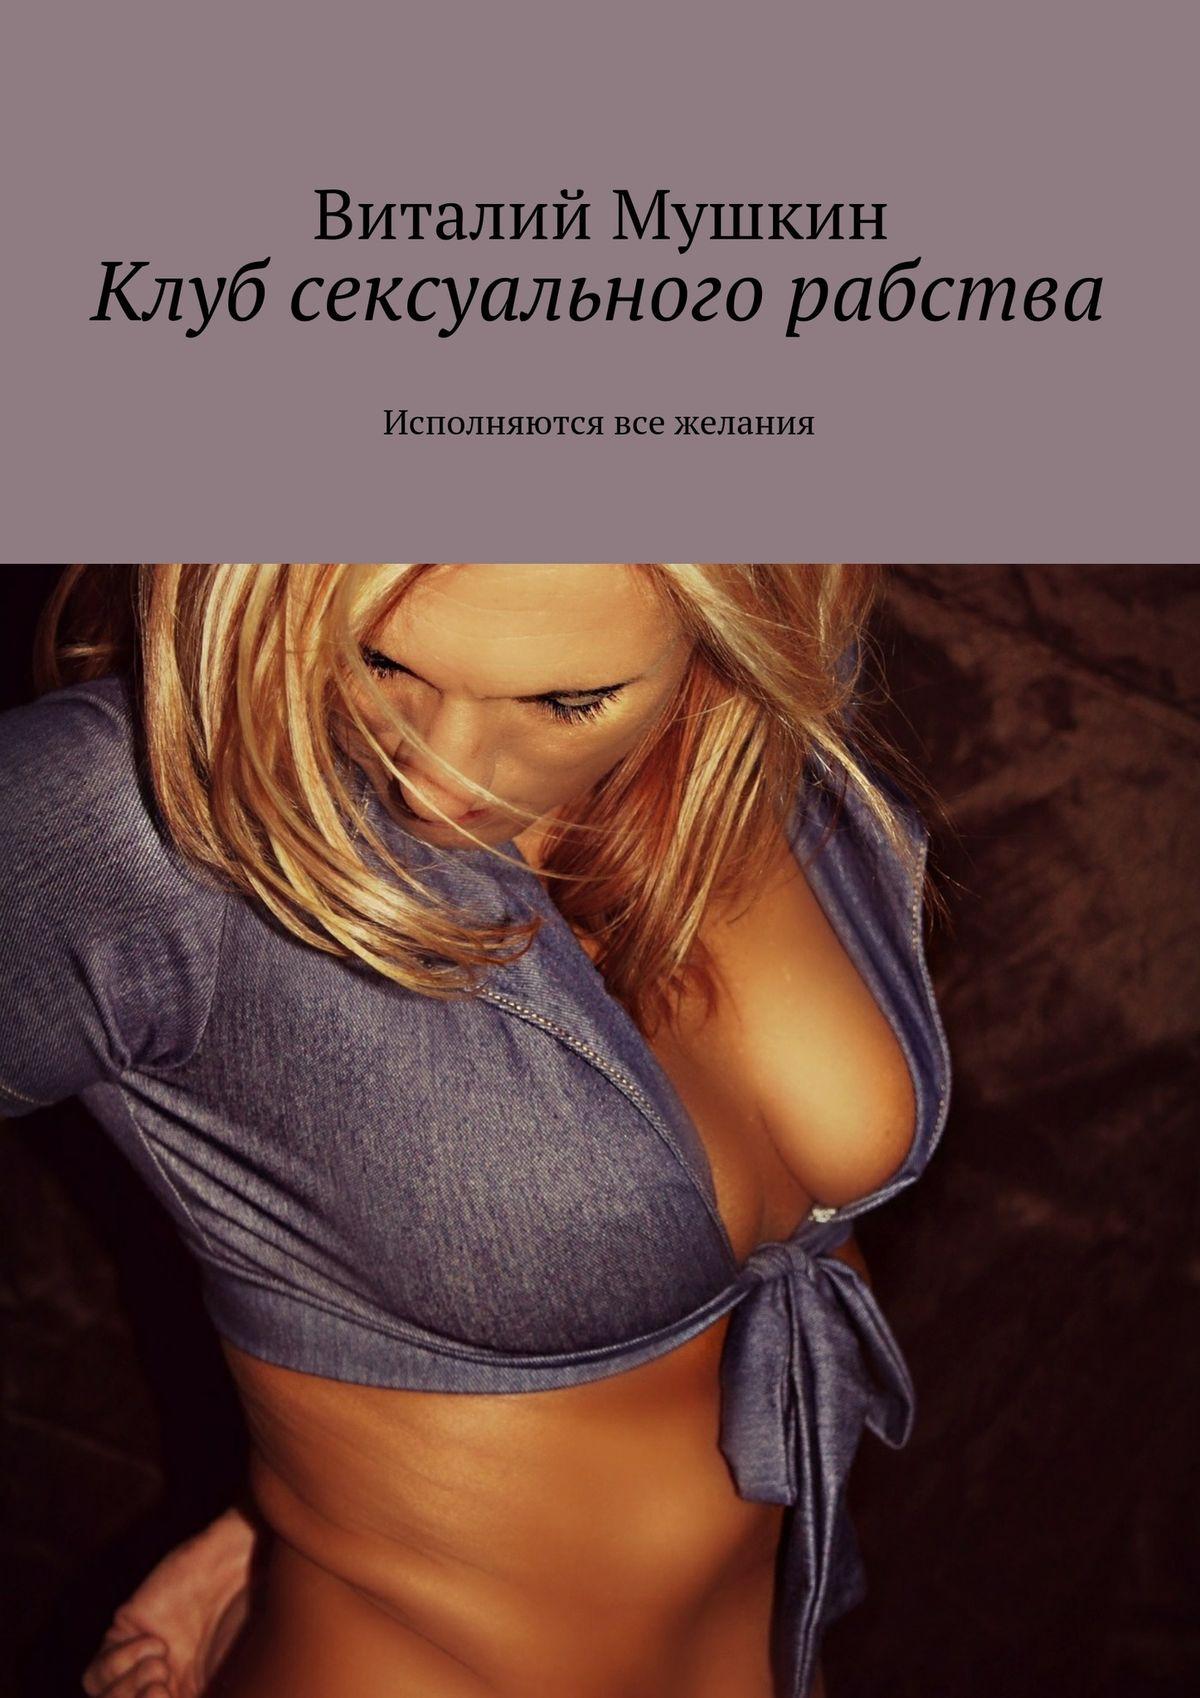 Виталий Мушкин Клуб сексуального рабства. Исполняются все желания виталий мушкин erotische geschichten top ten